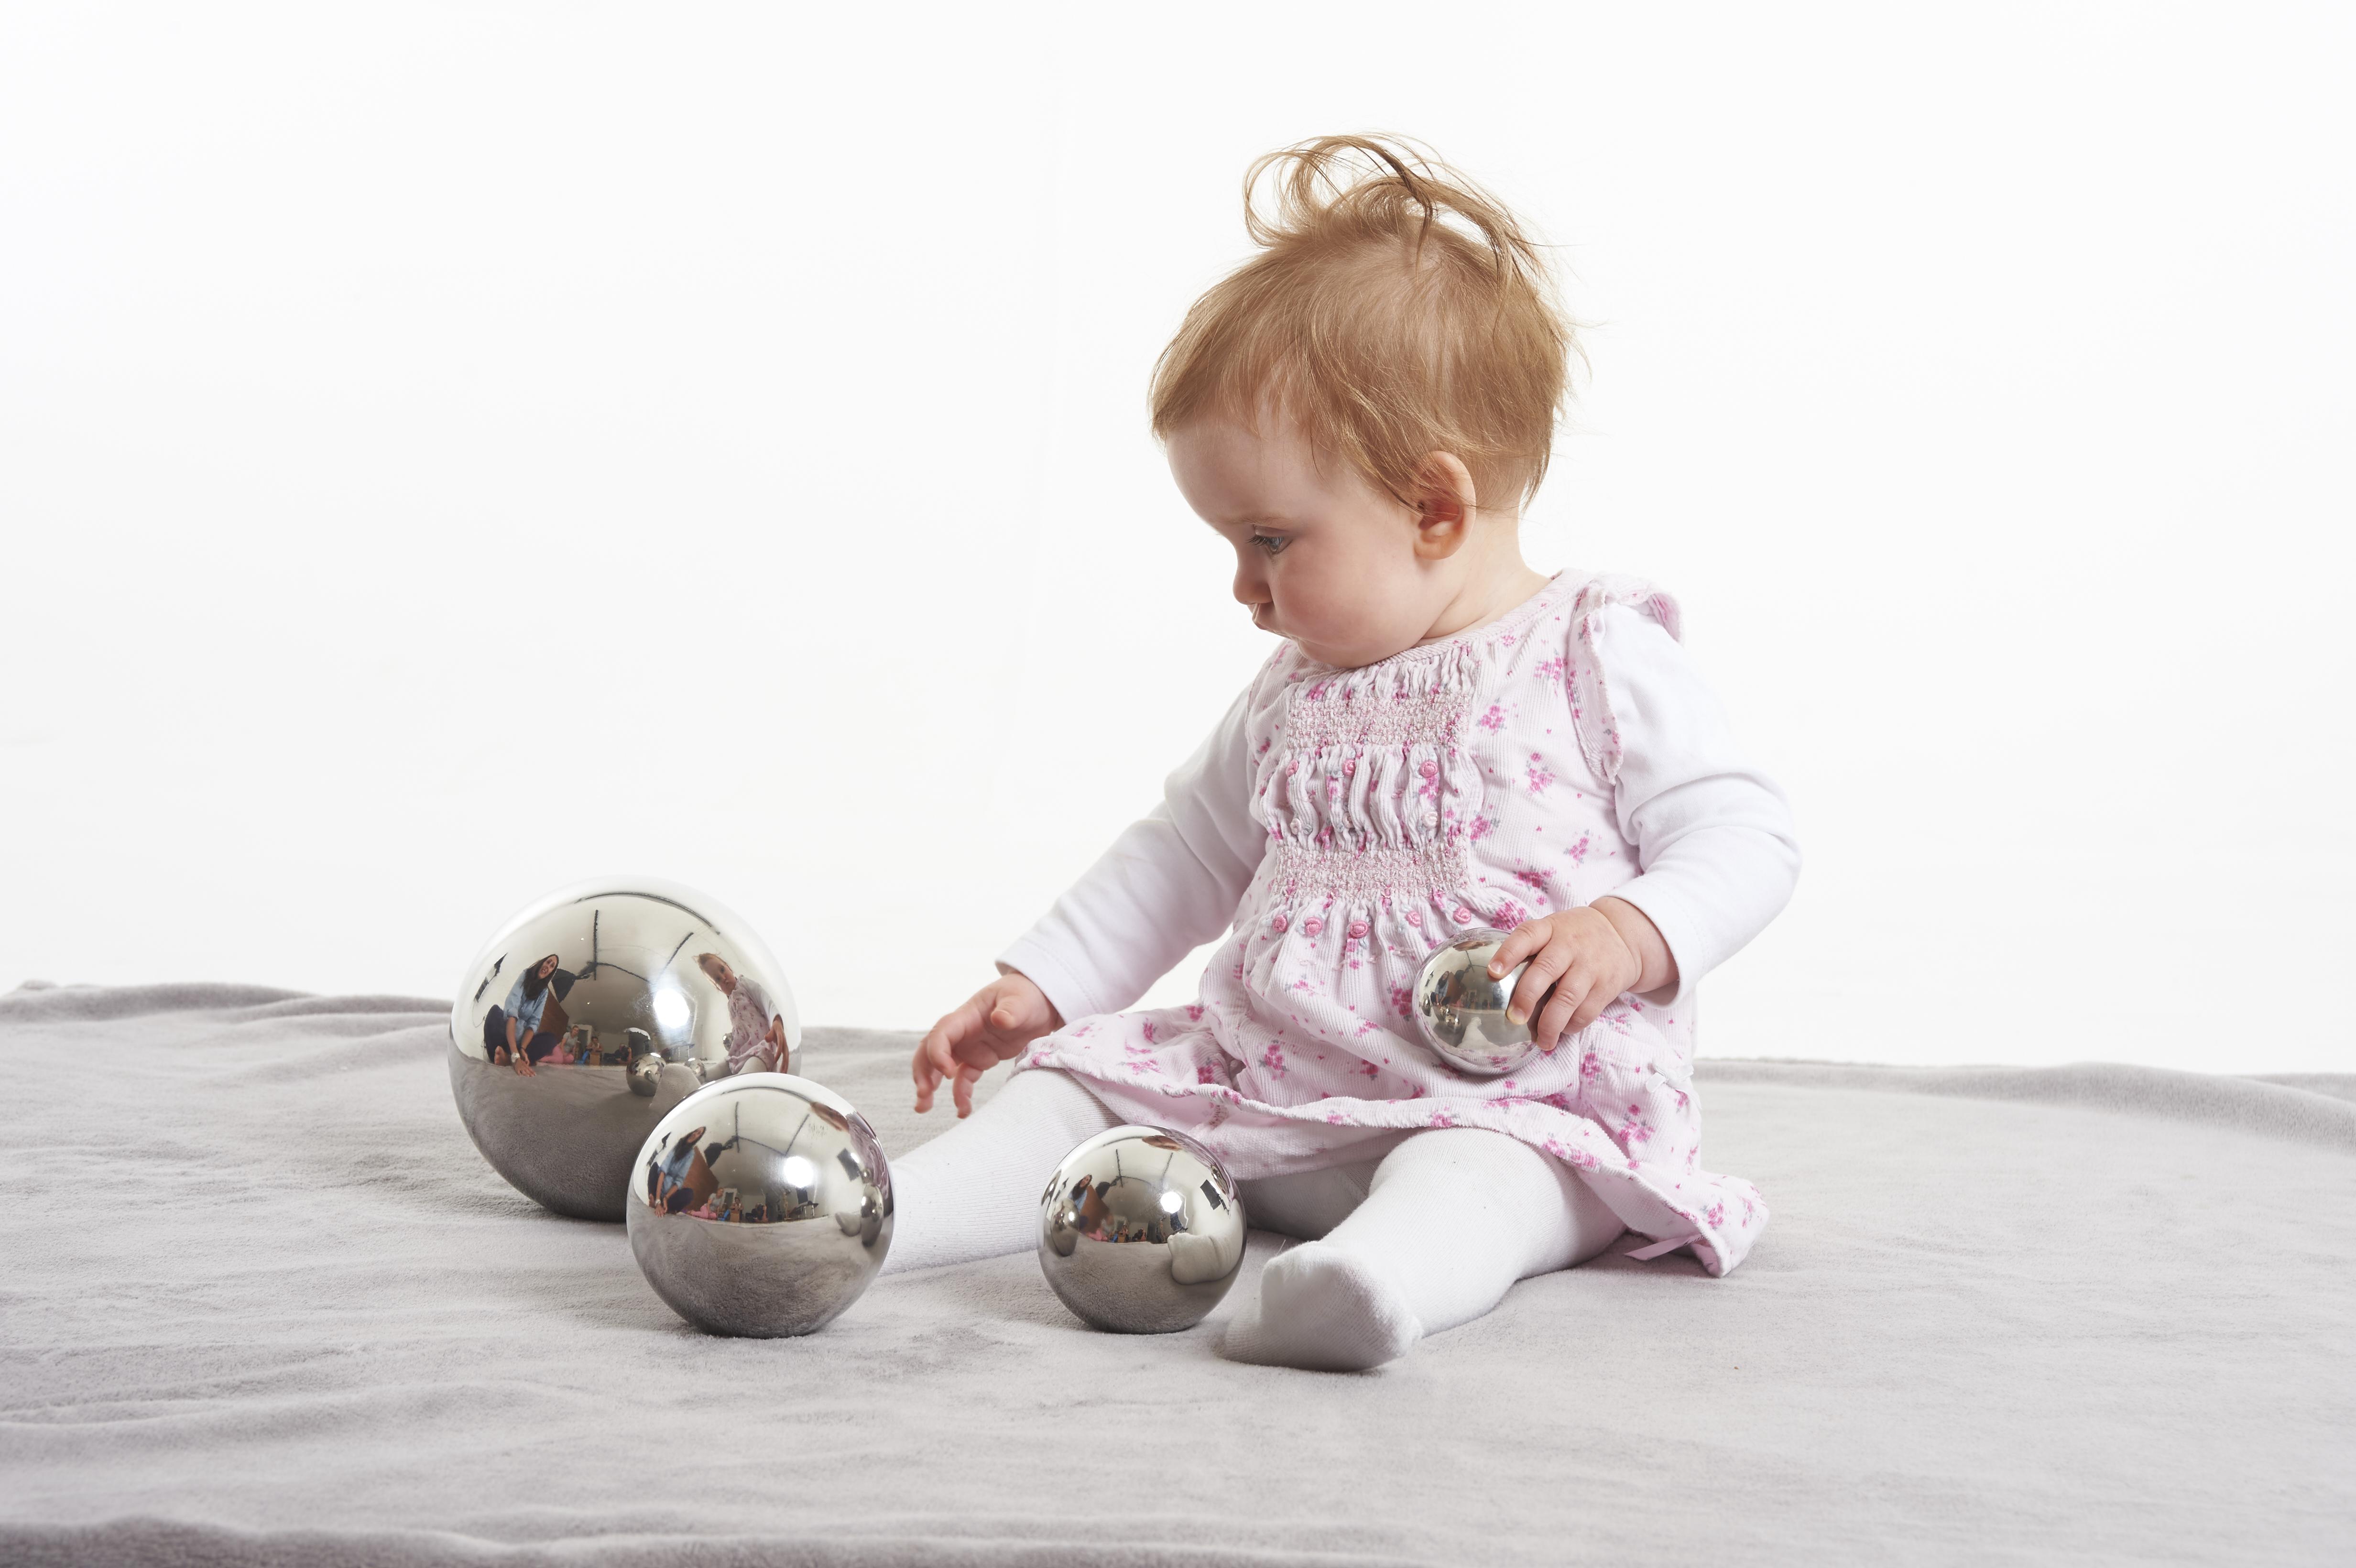 4-teilig Sensorischer TickiT 72201 Silberner Reflektierender Ball